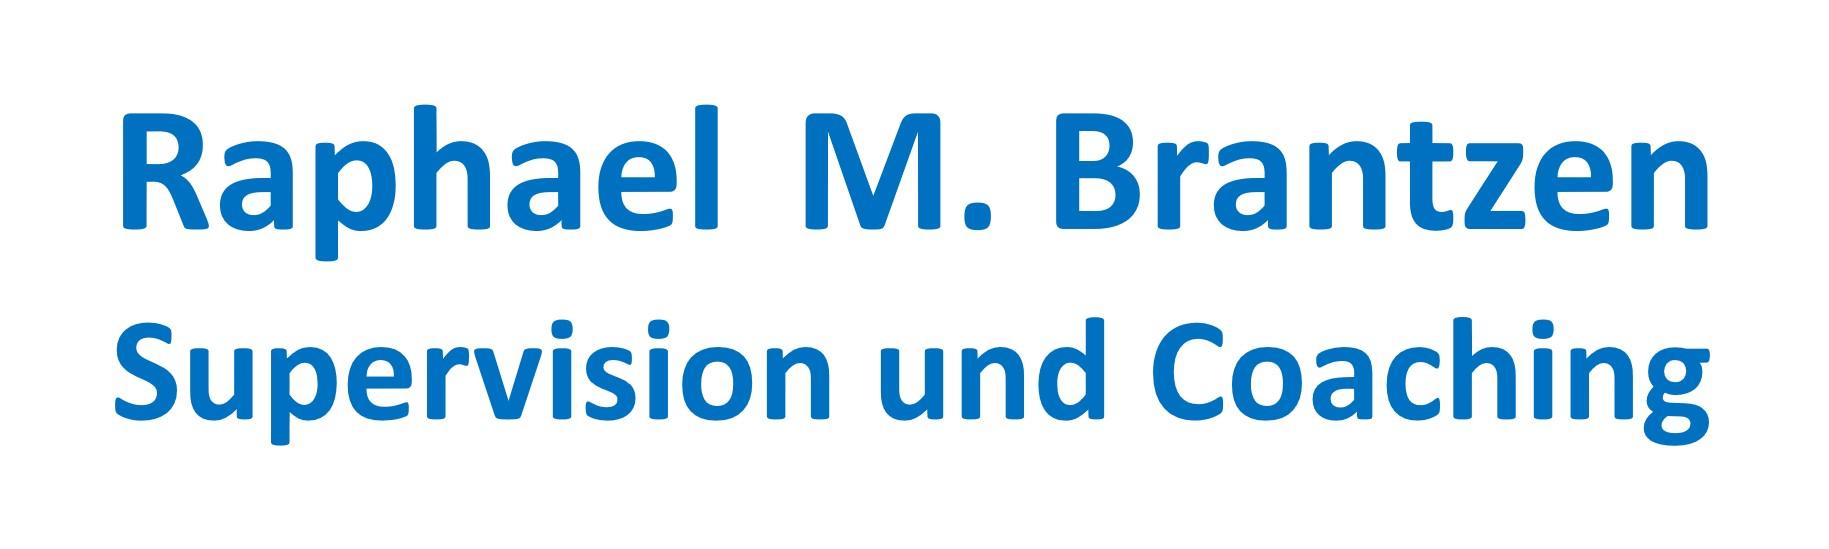 Brantzen Coching